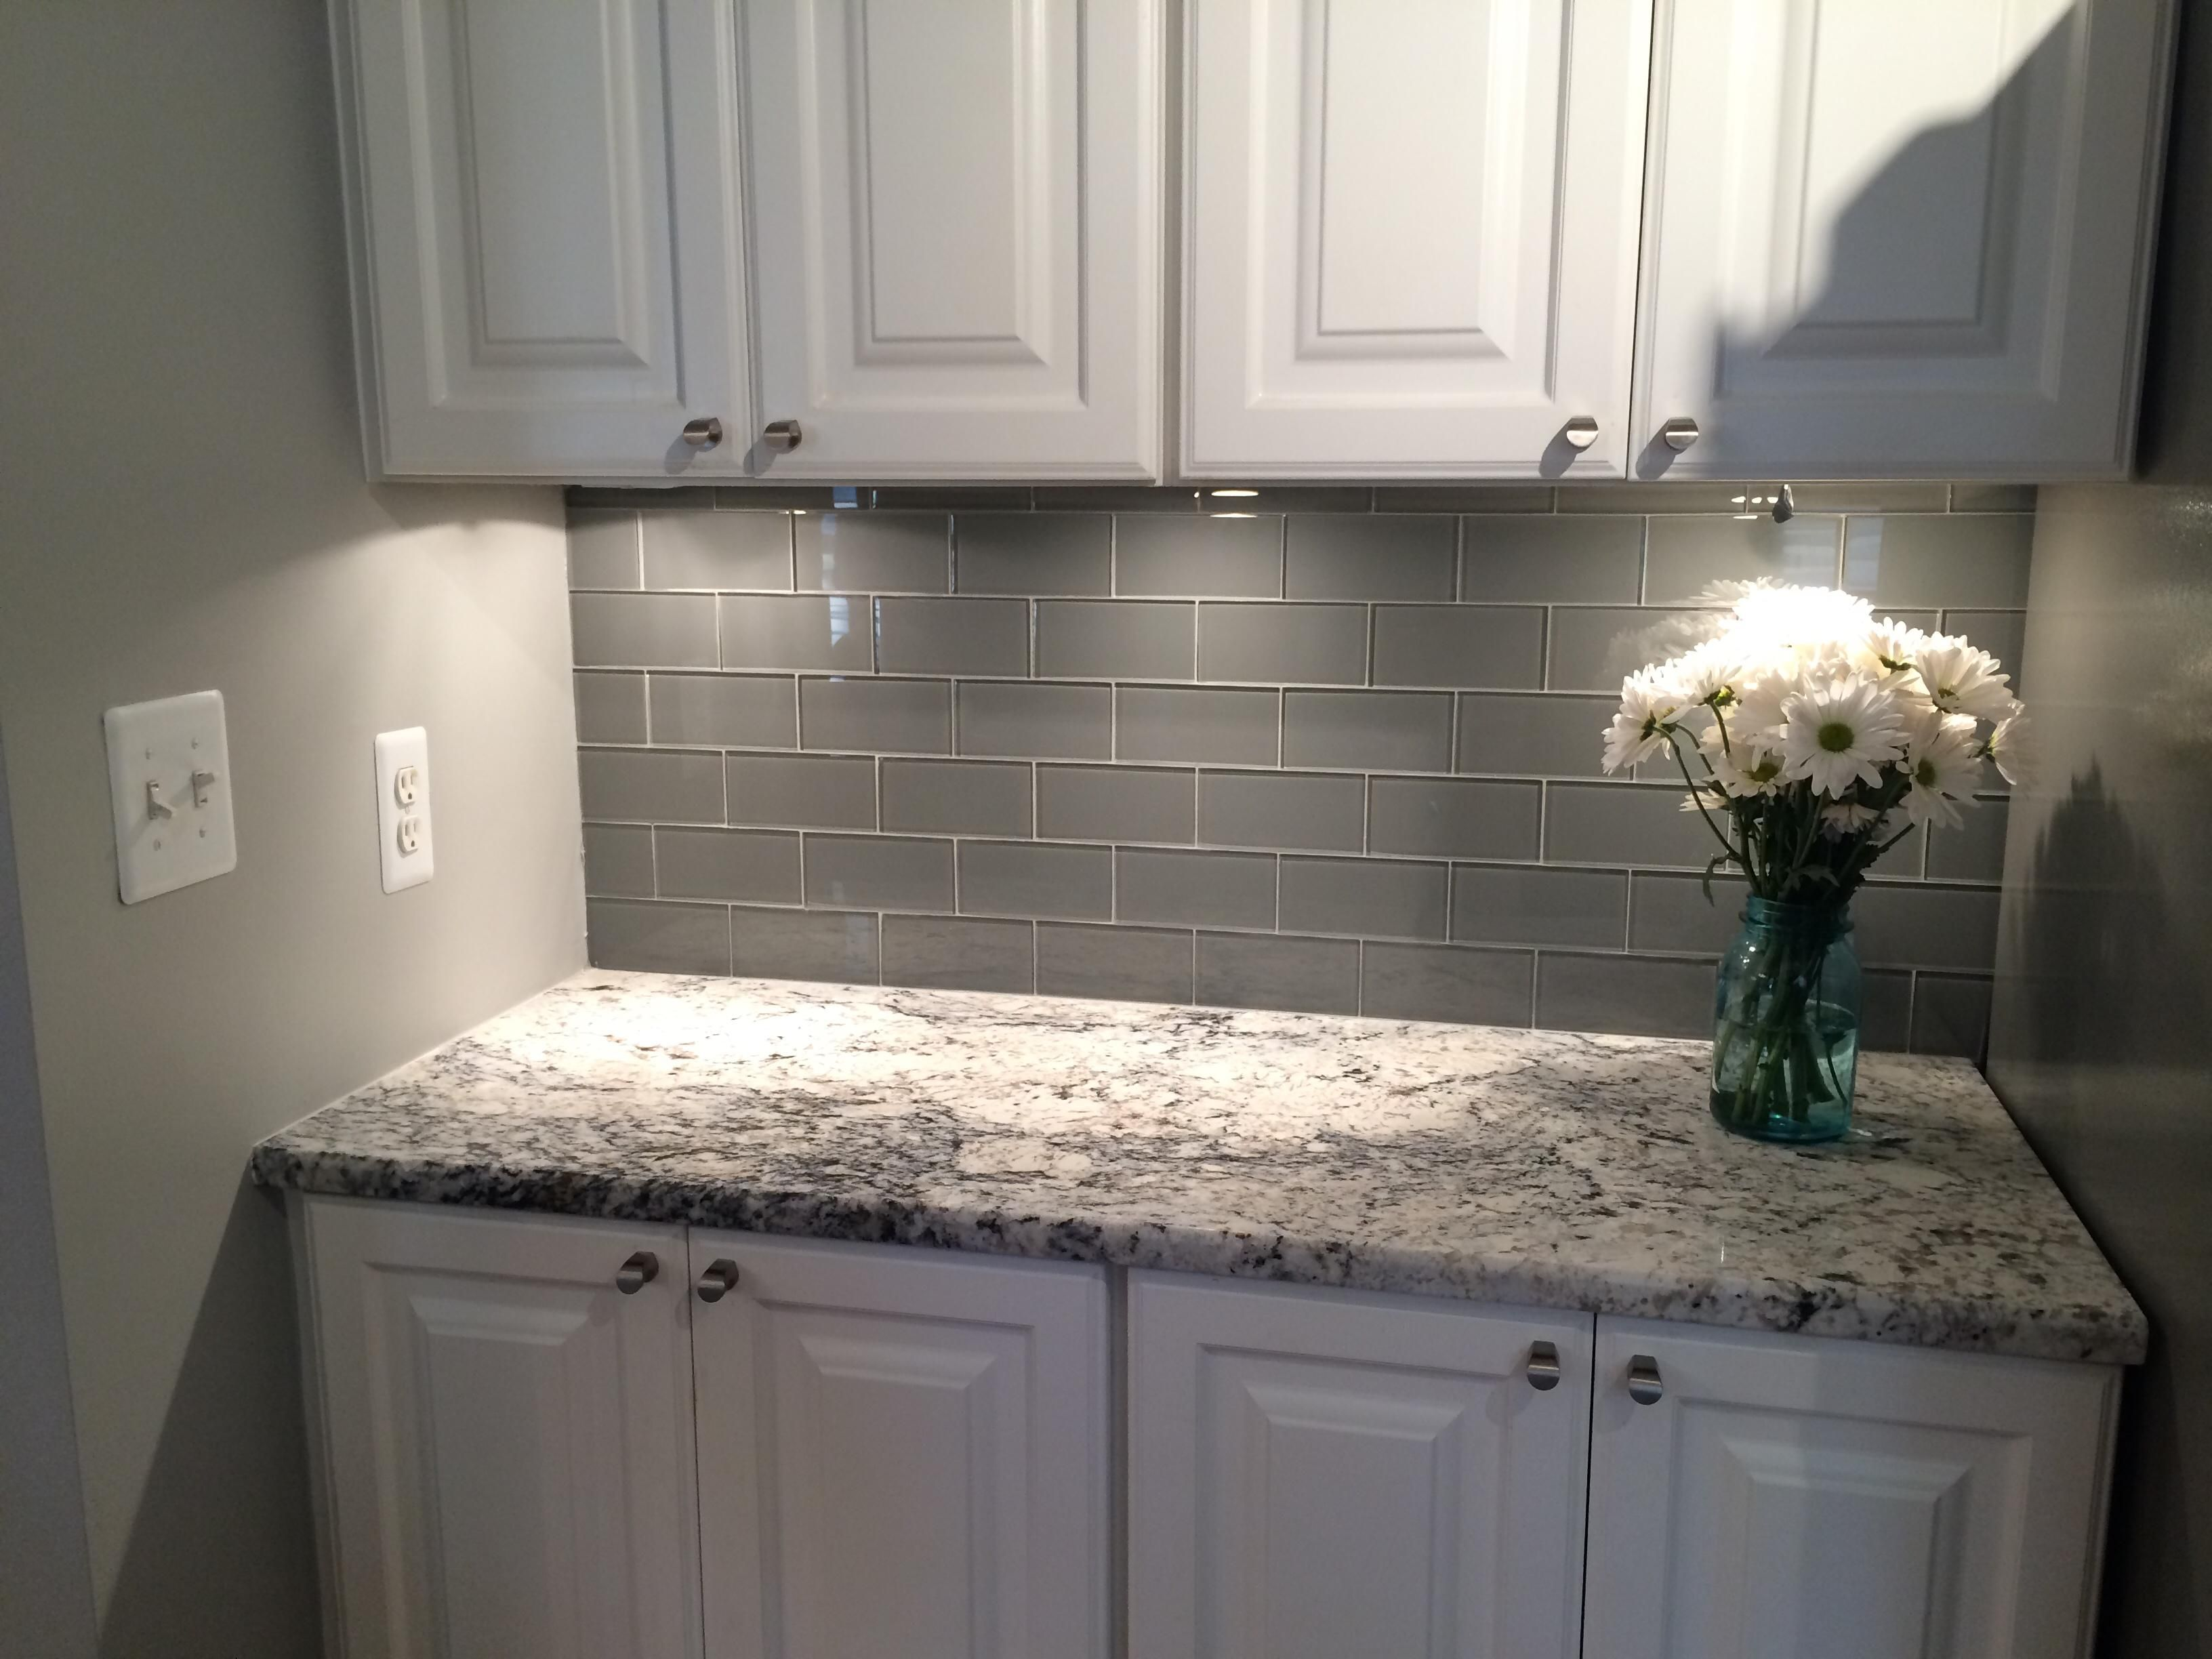 white tile backsplash kitchen glass door handles 3 subway